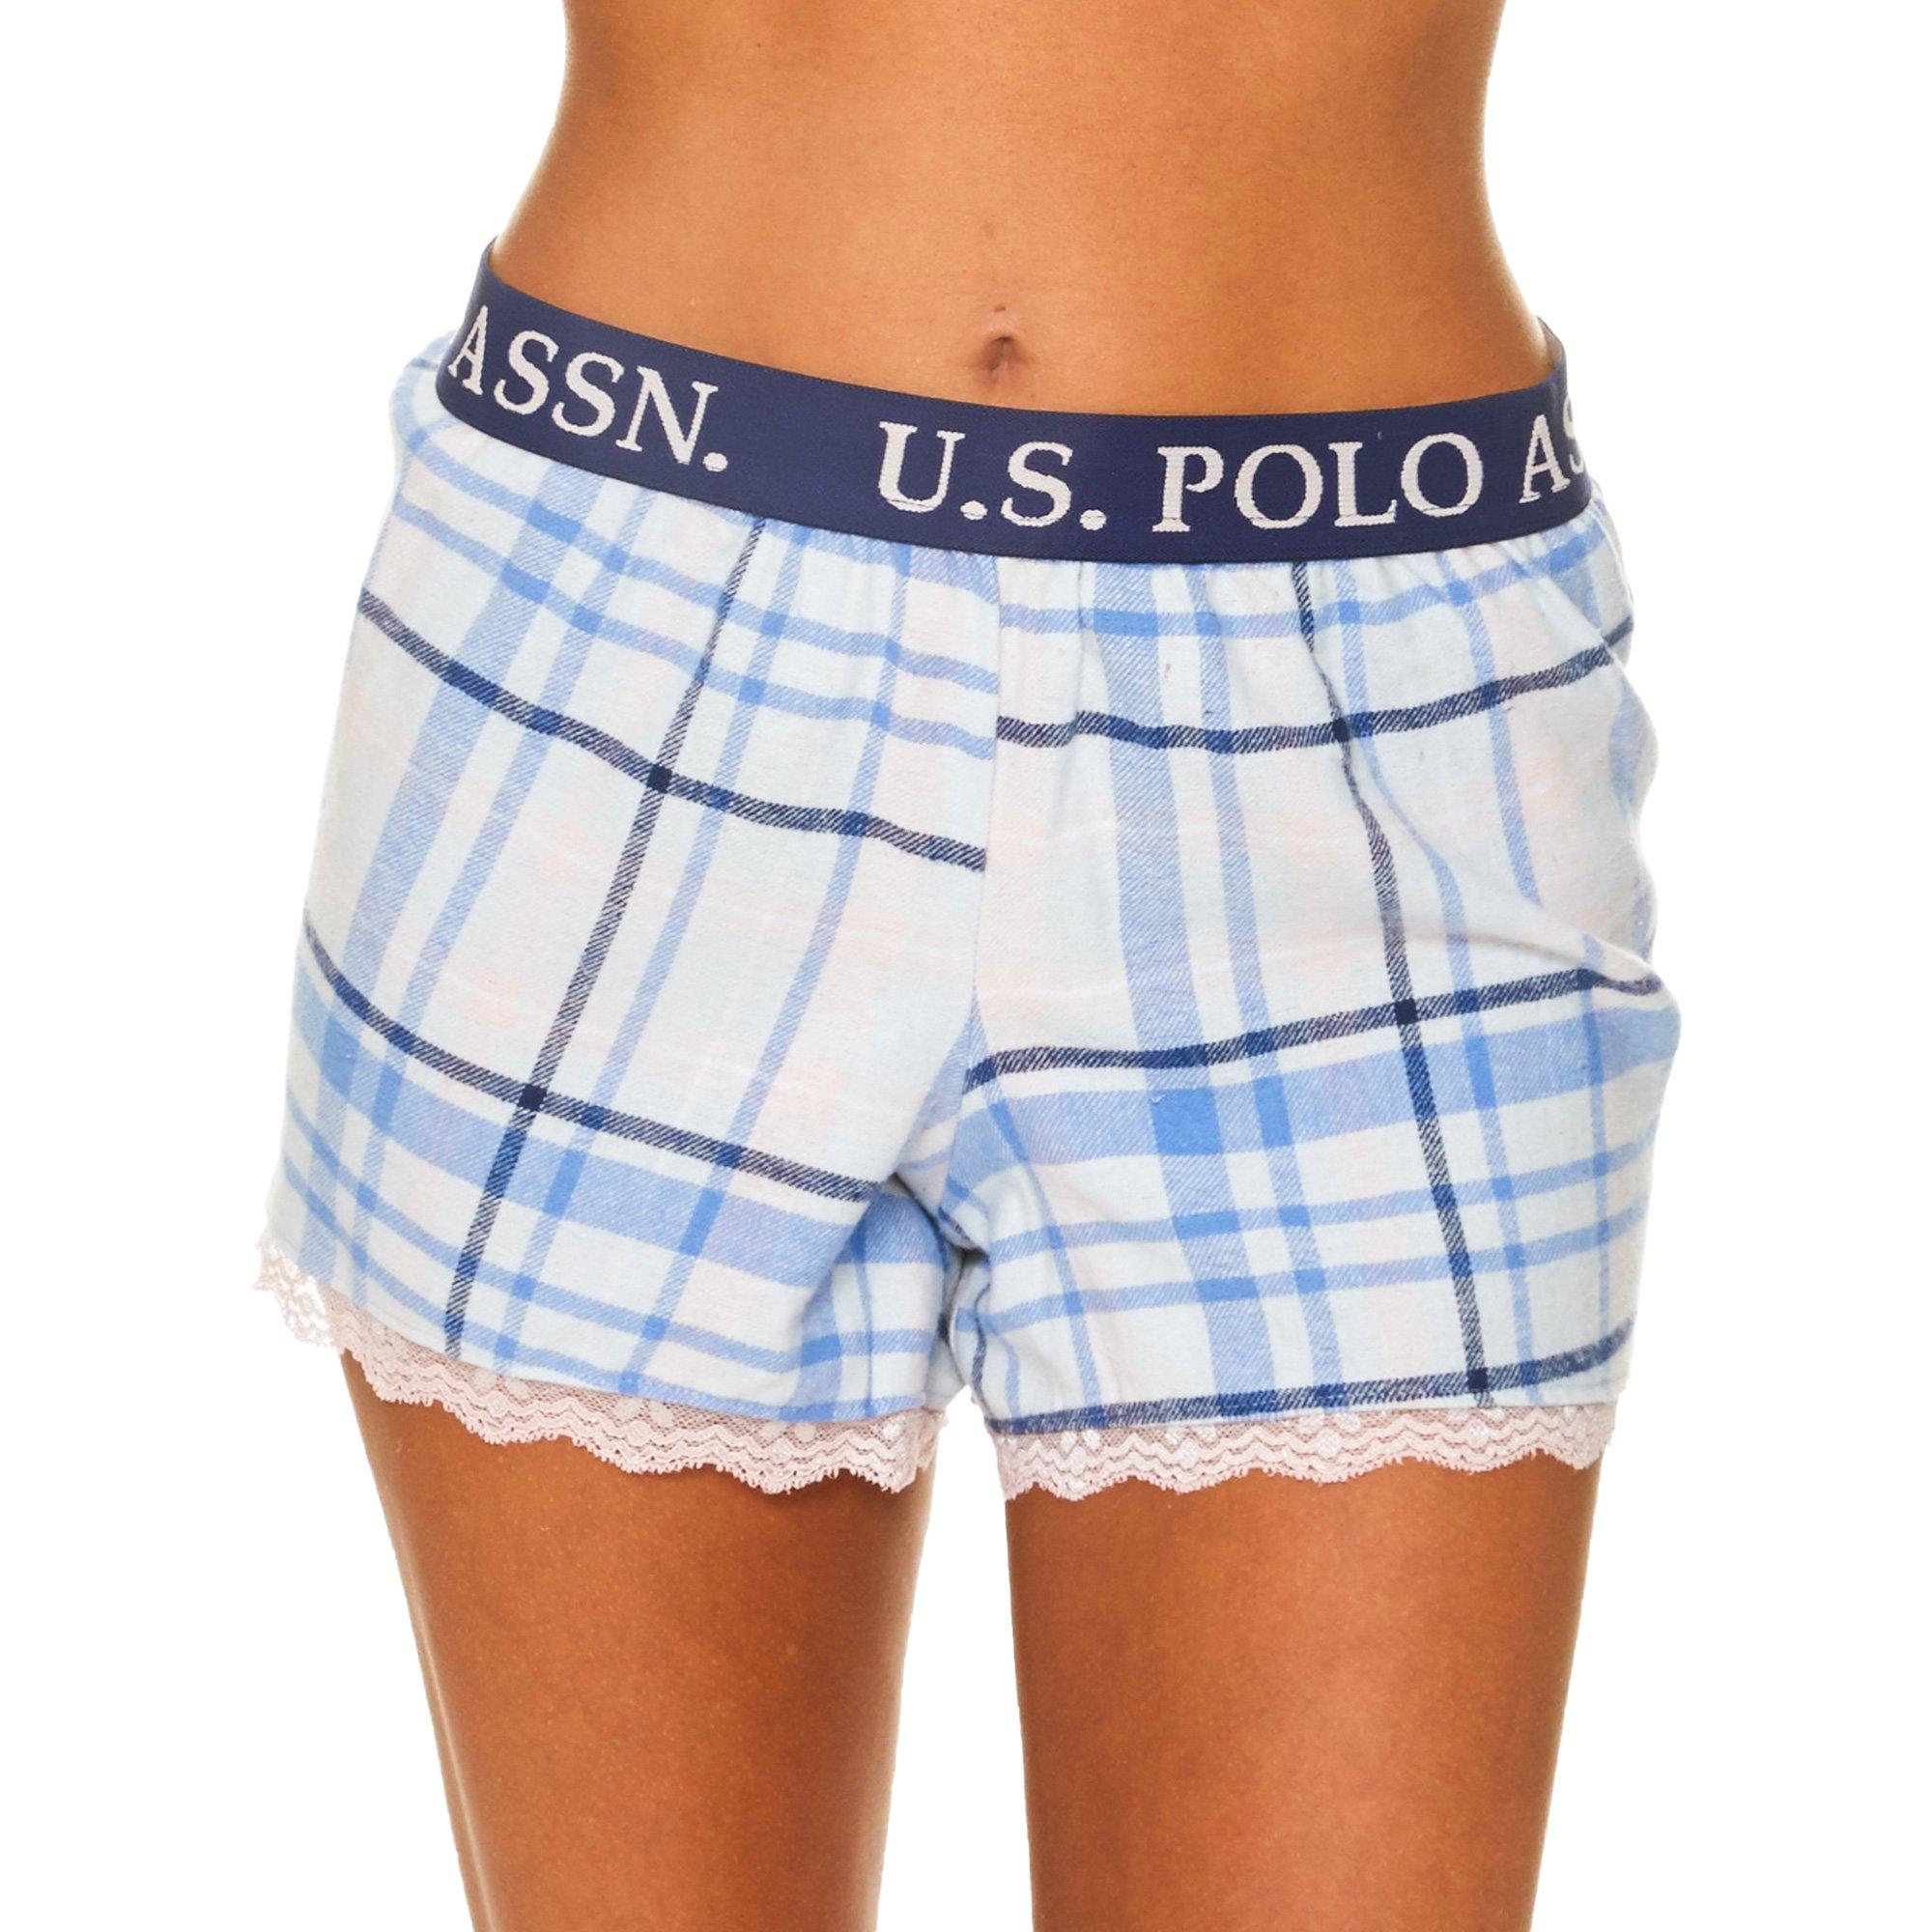 U.S. Polo Assn.. Womens Plaid Flannel Pajama Lounge Shorts with Lace Trim Light Blue Medium